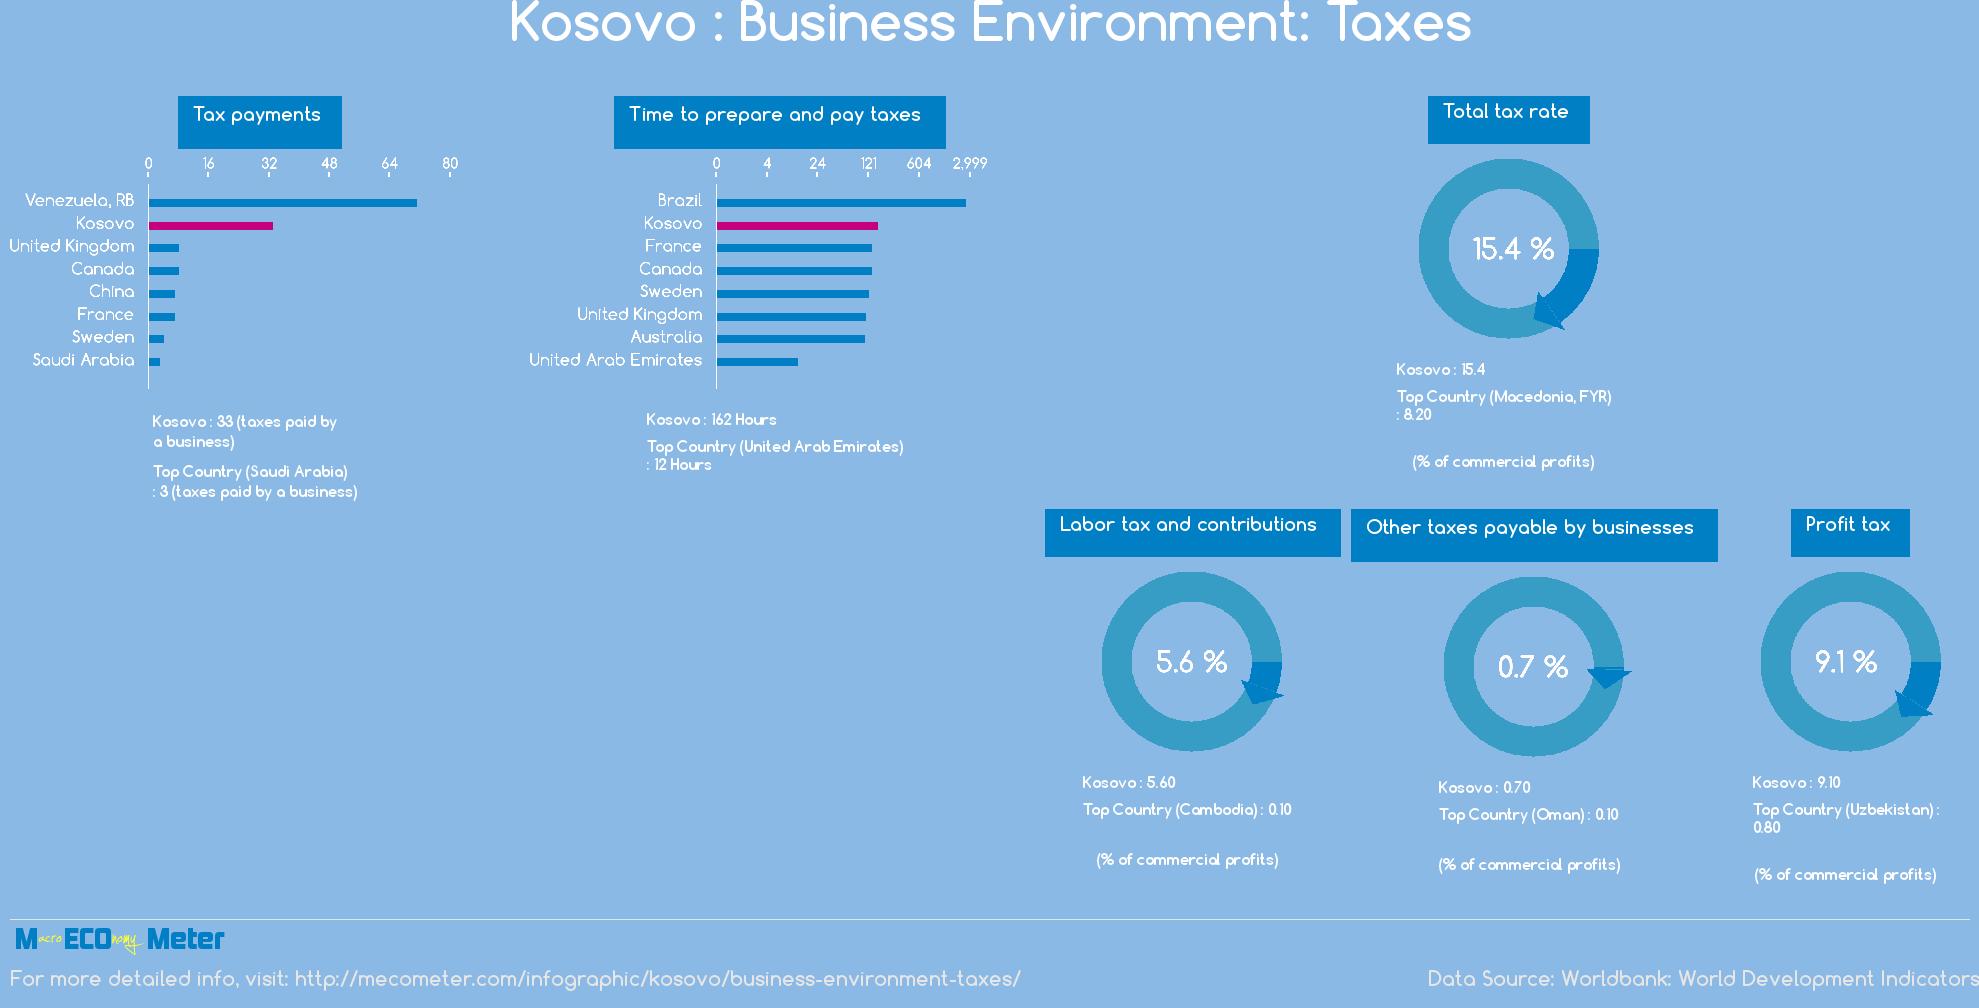 Kosovo : Business Environment: Taxes